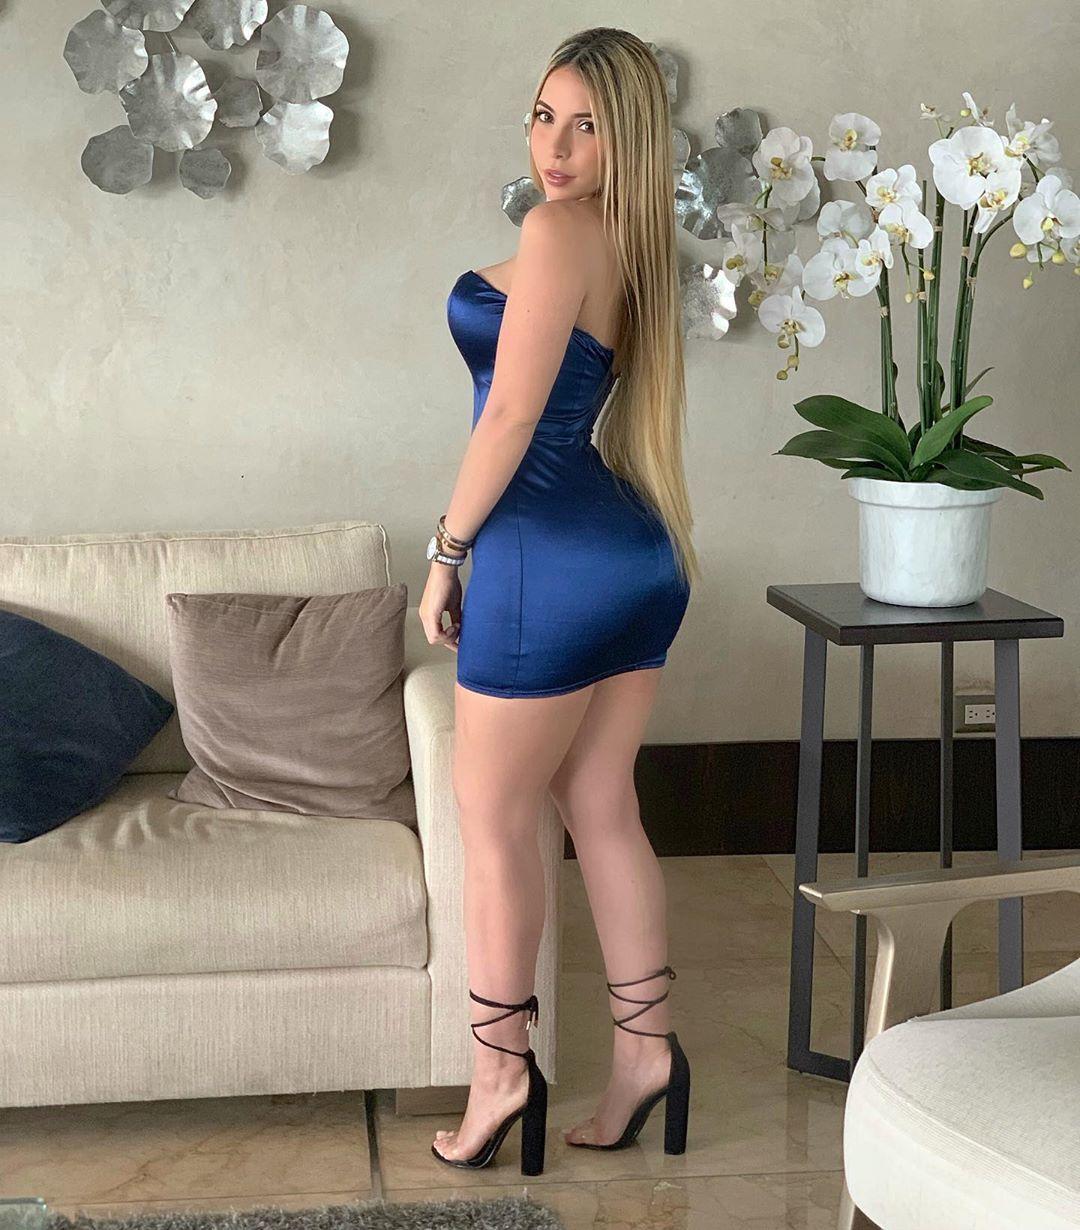 vanessa_bohorquez009.jpg